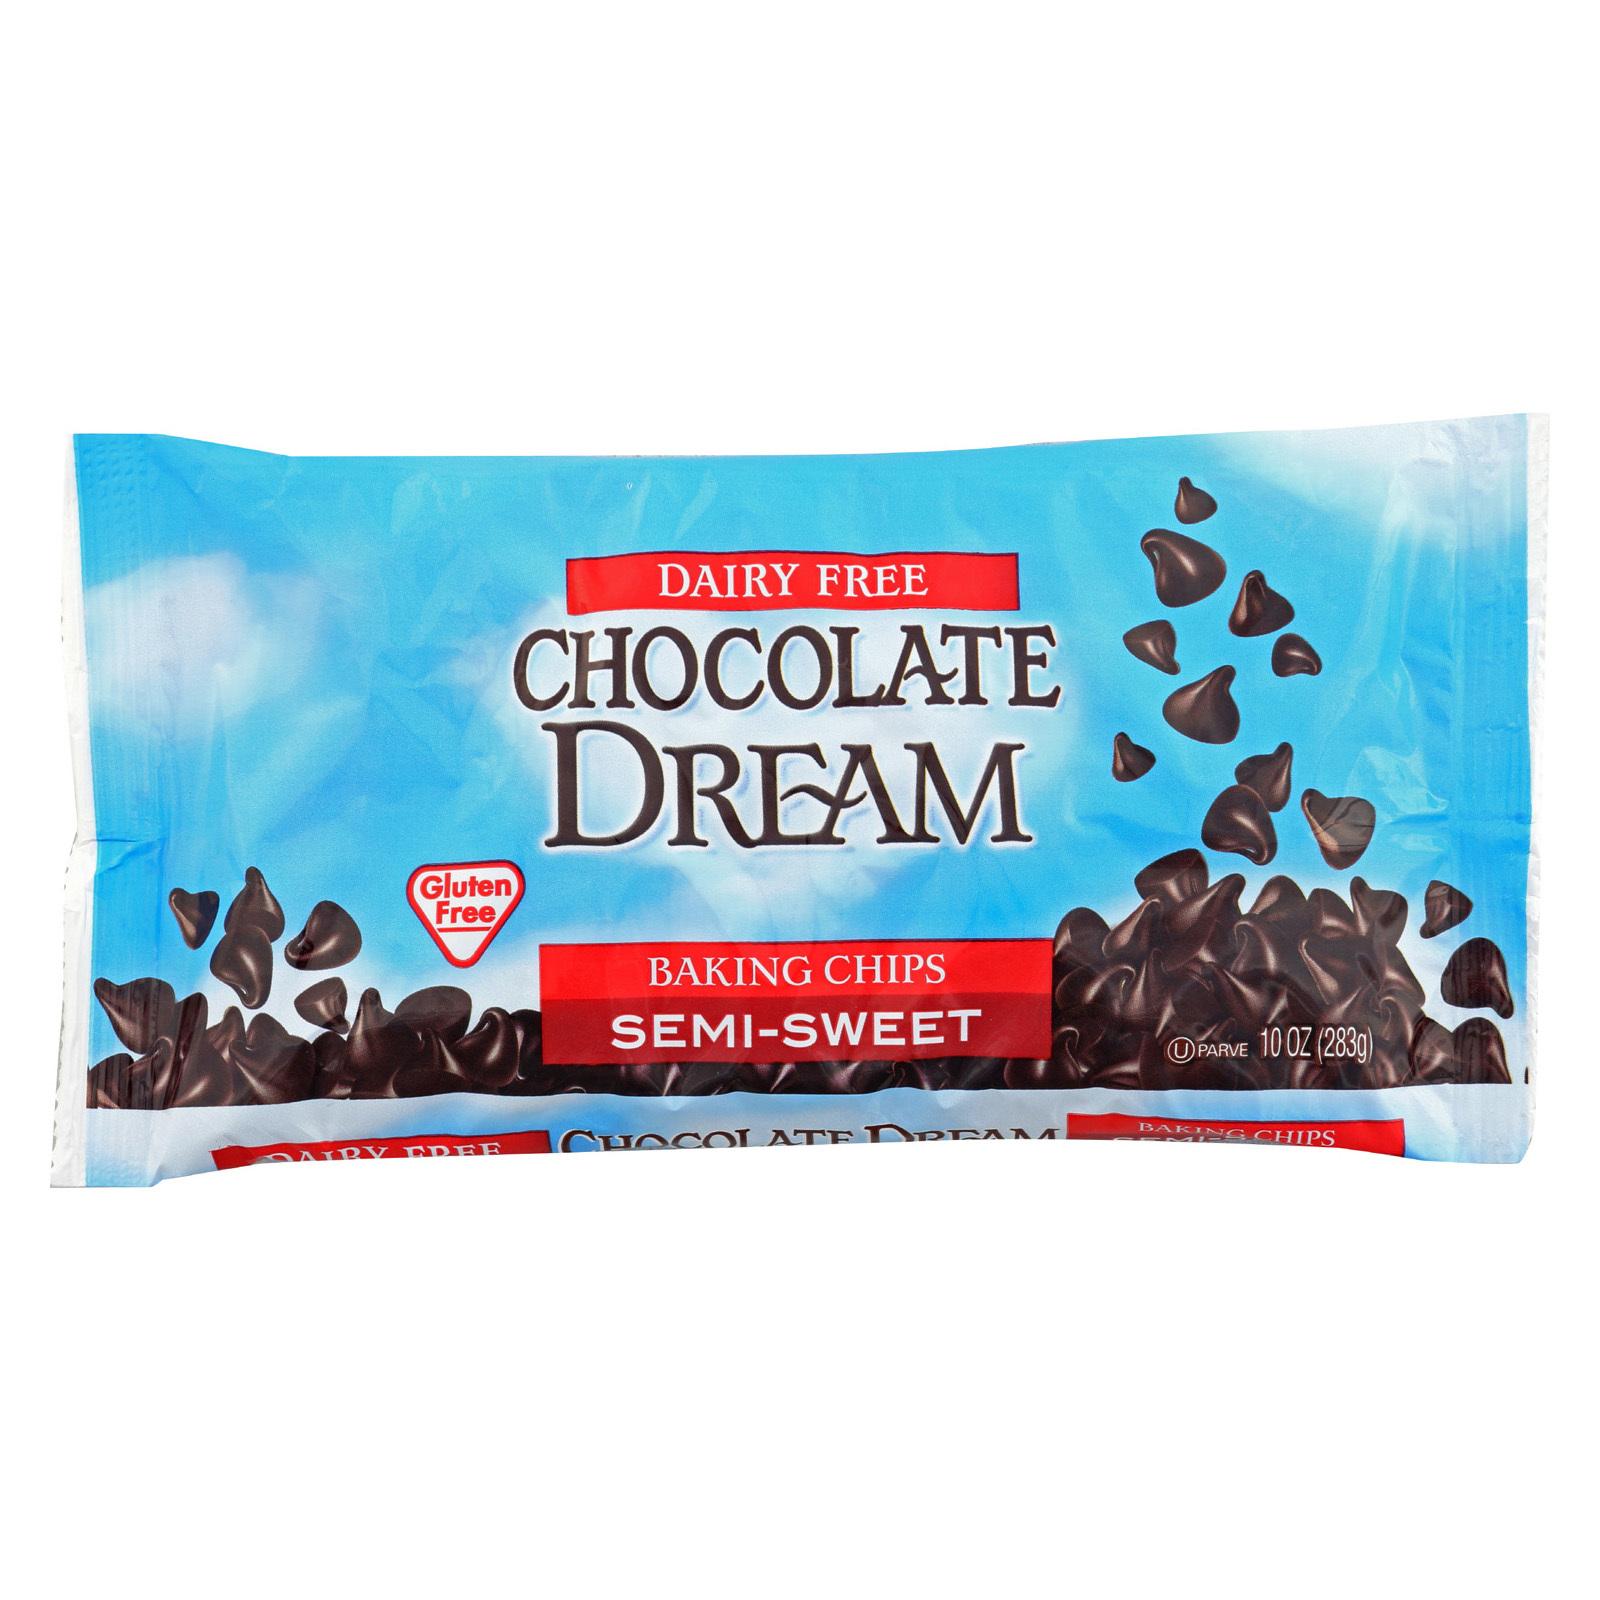 Chocolate Dream Chocolate Chips - Semi Sweet - Case of 12 - 10 oz